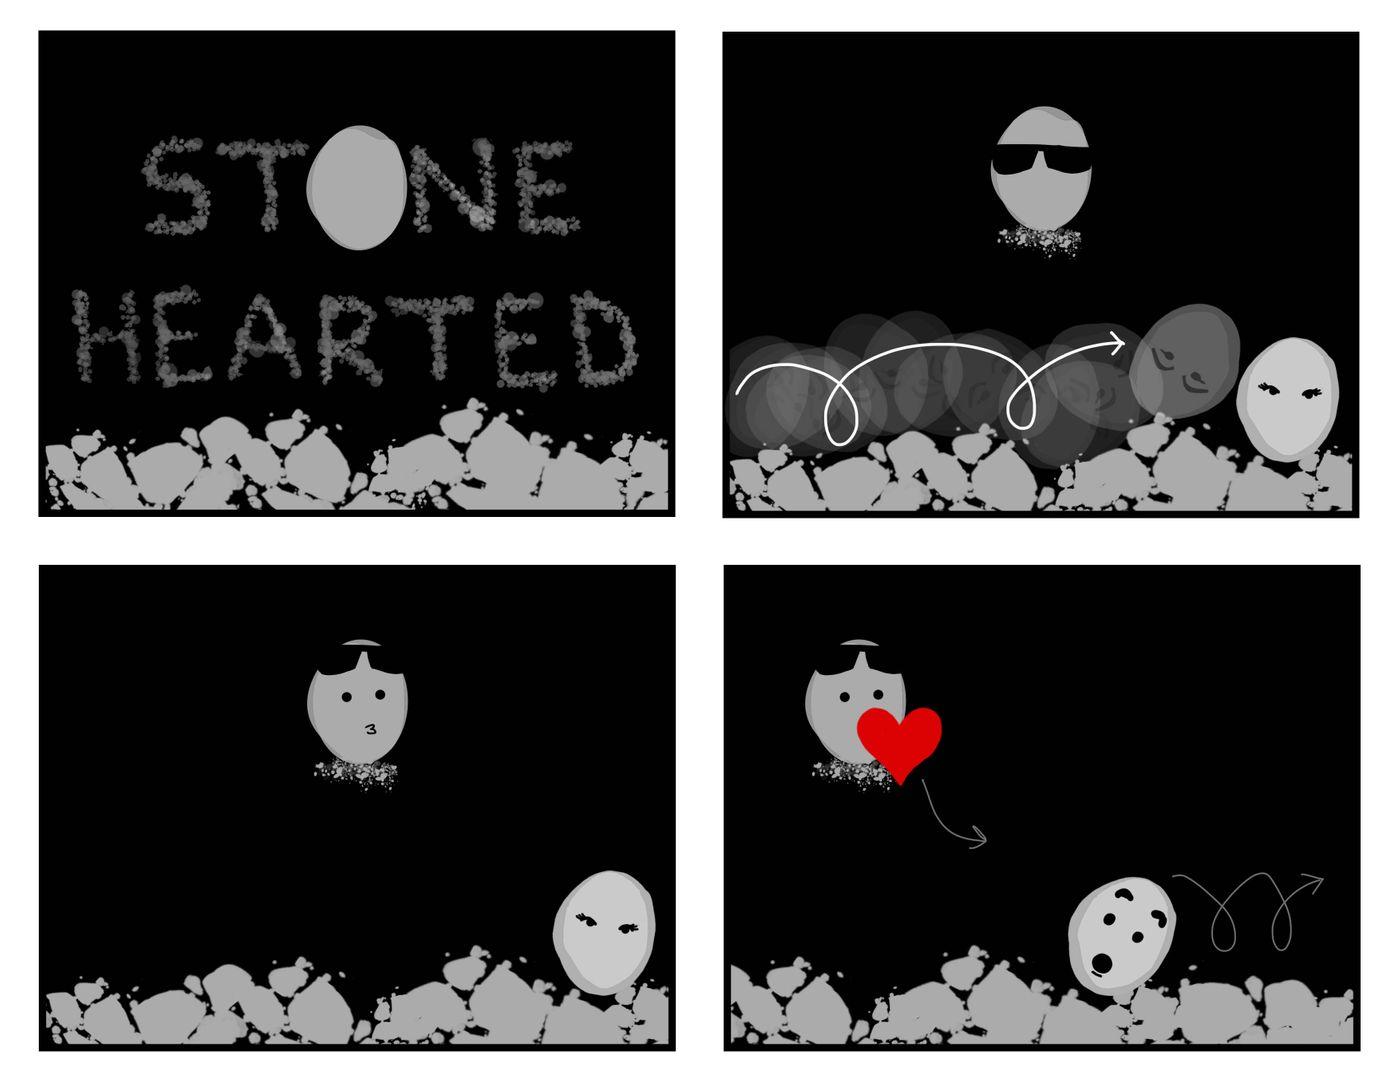 Stone Hearted%20storyboard%202 Avanibabar